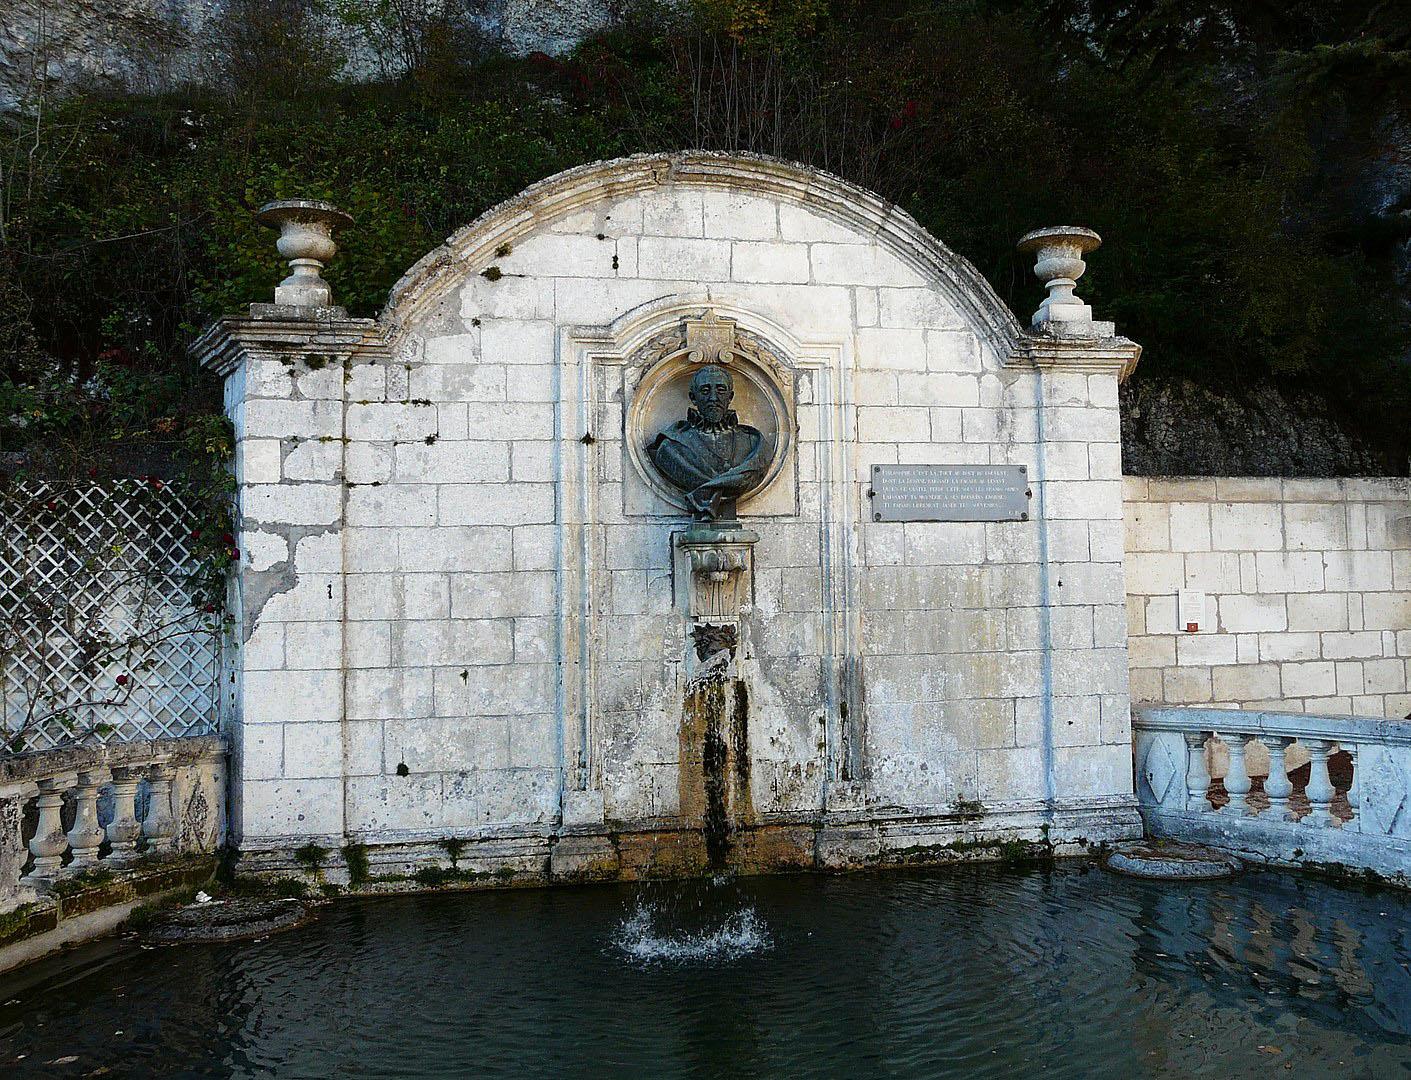 Water fontaine - Brantôme